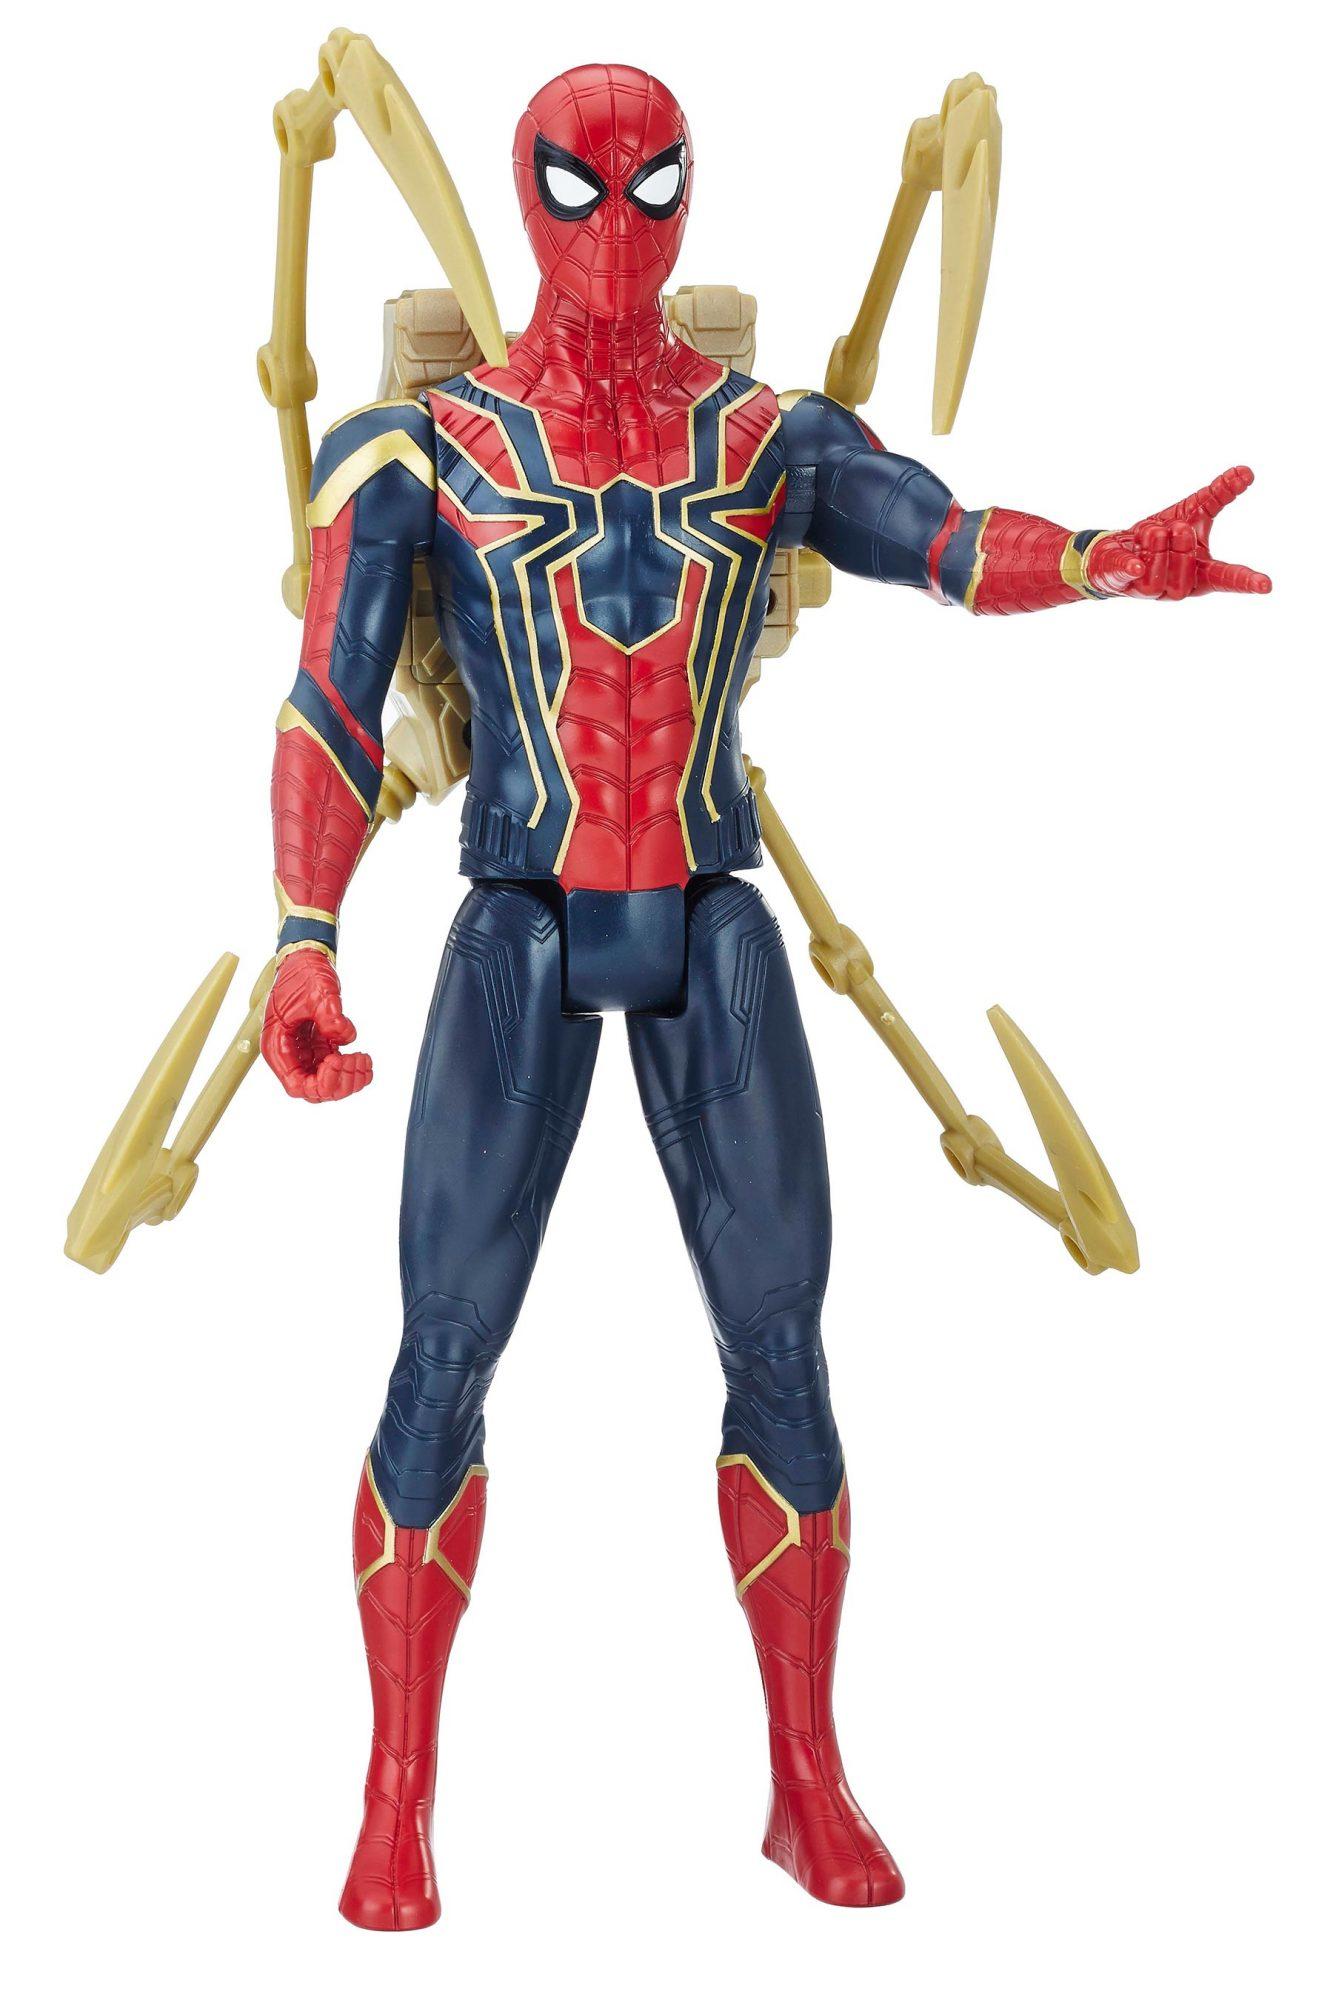 Marvel Avengers Infinity War ToysCR: Hasbro